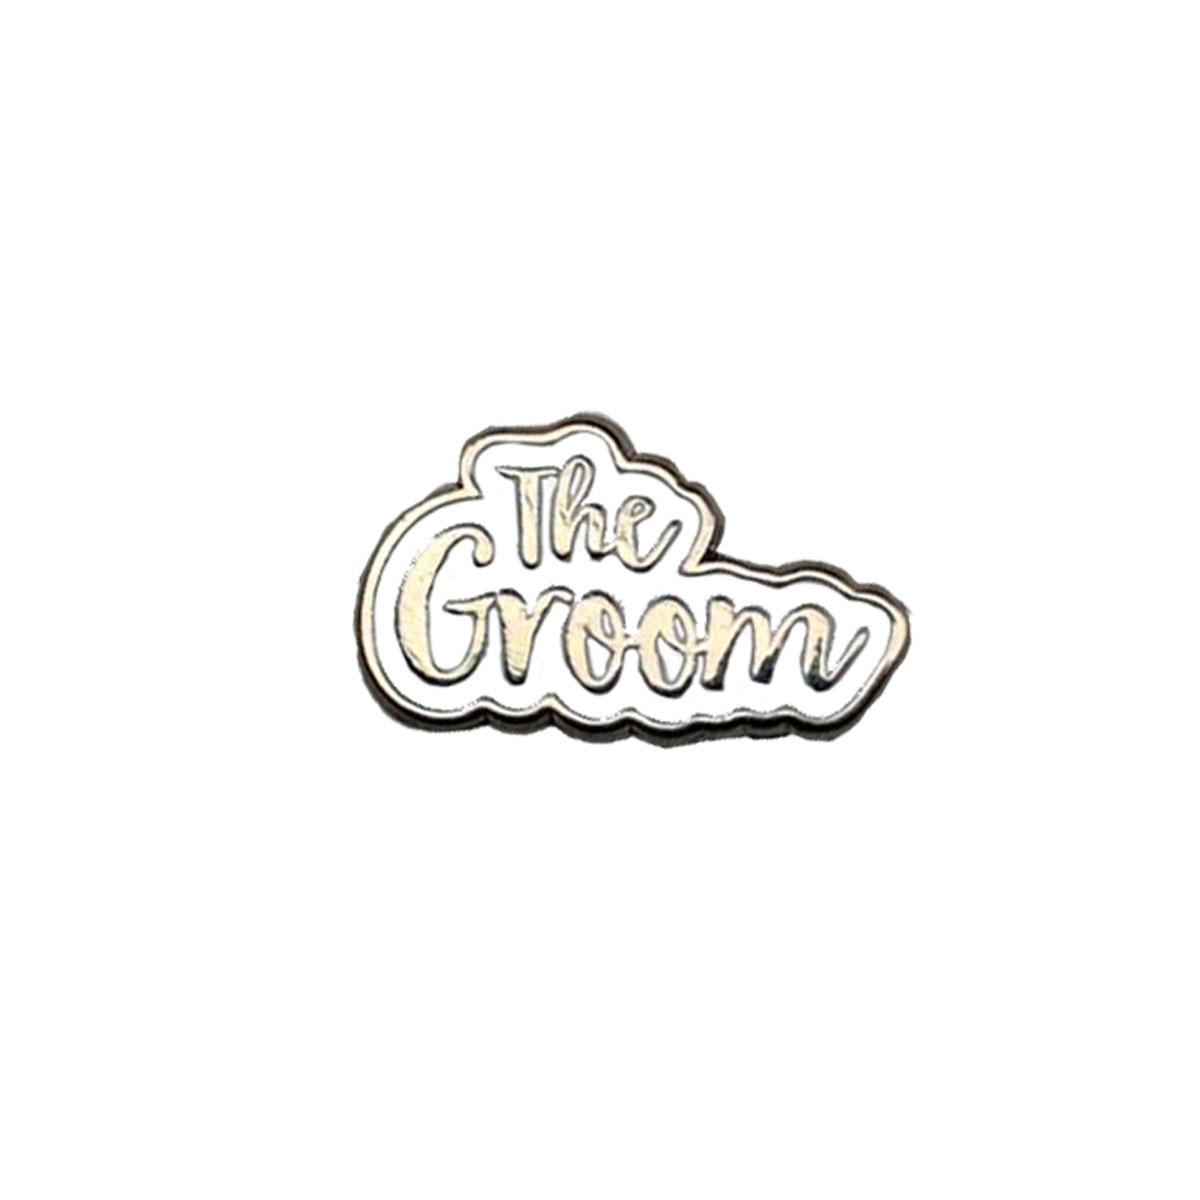 The Groom White Wedding